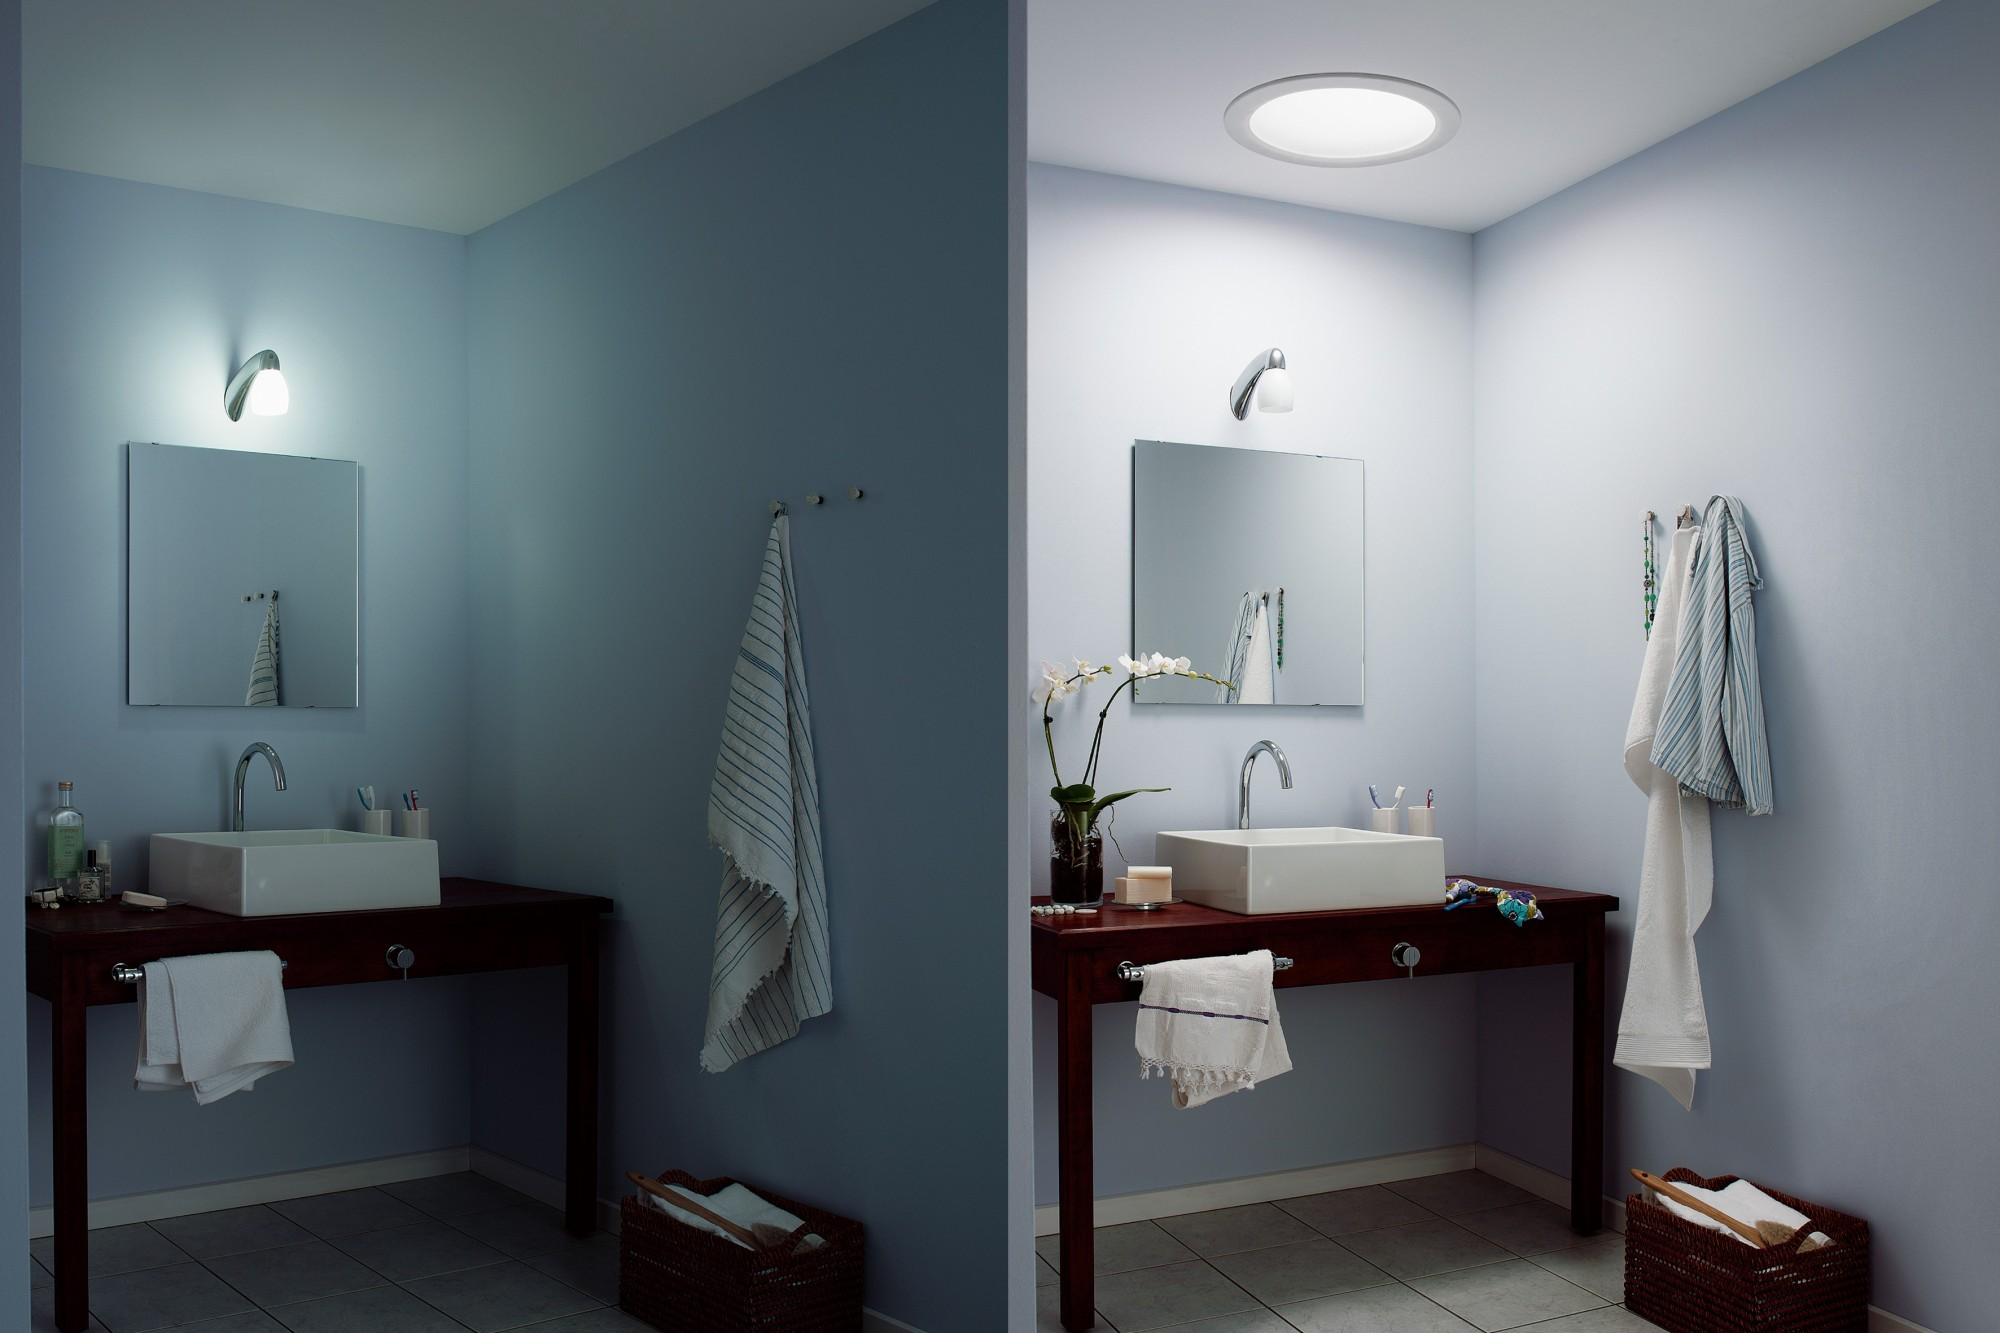 installer conduit lumiere velux salle de bain